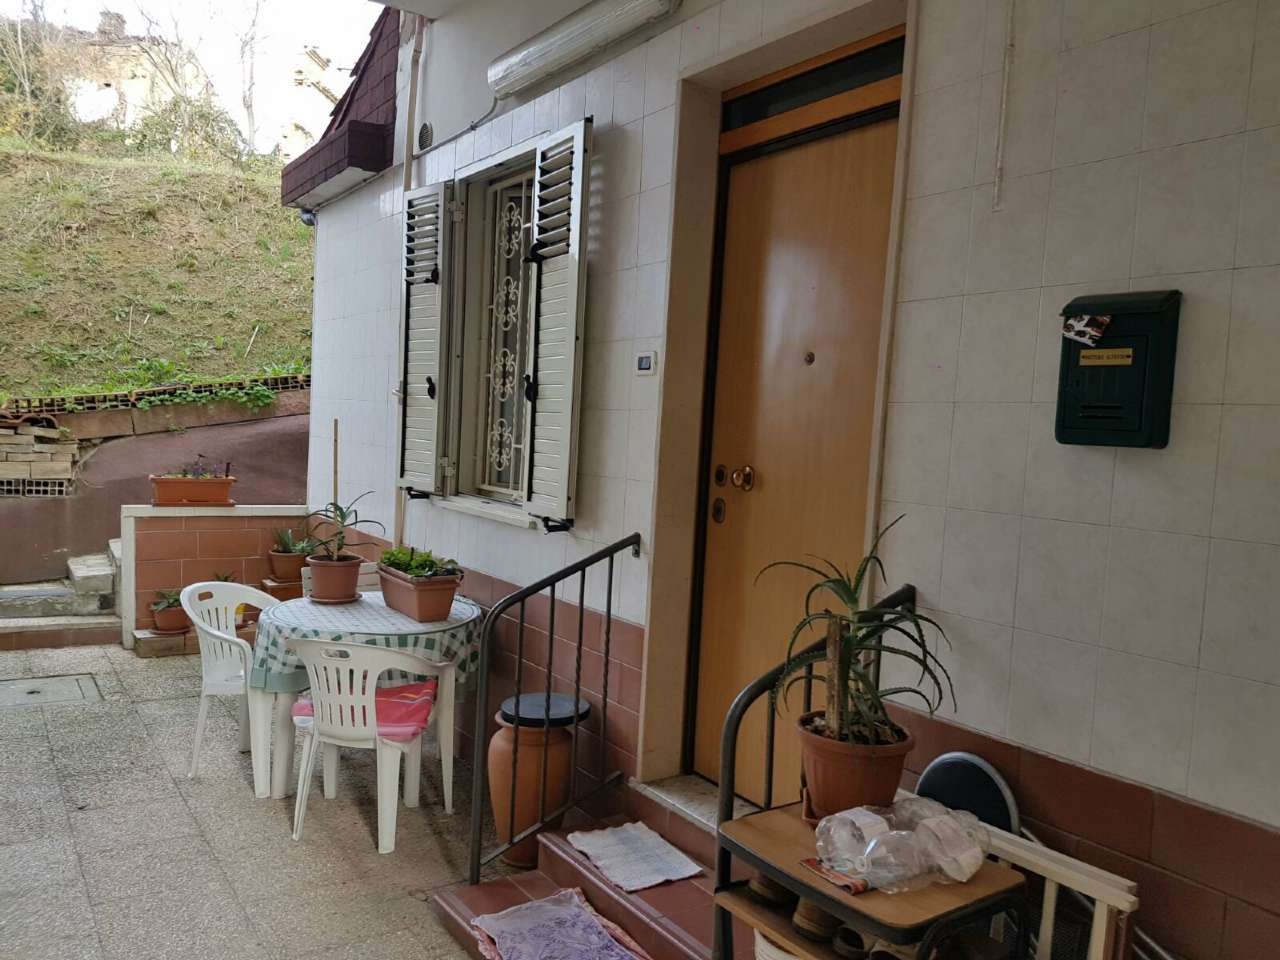 Appartamento, Via Tiberi, Colli, Vendita - Pescara (Pescara)